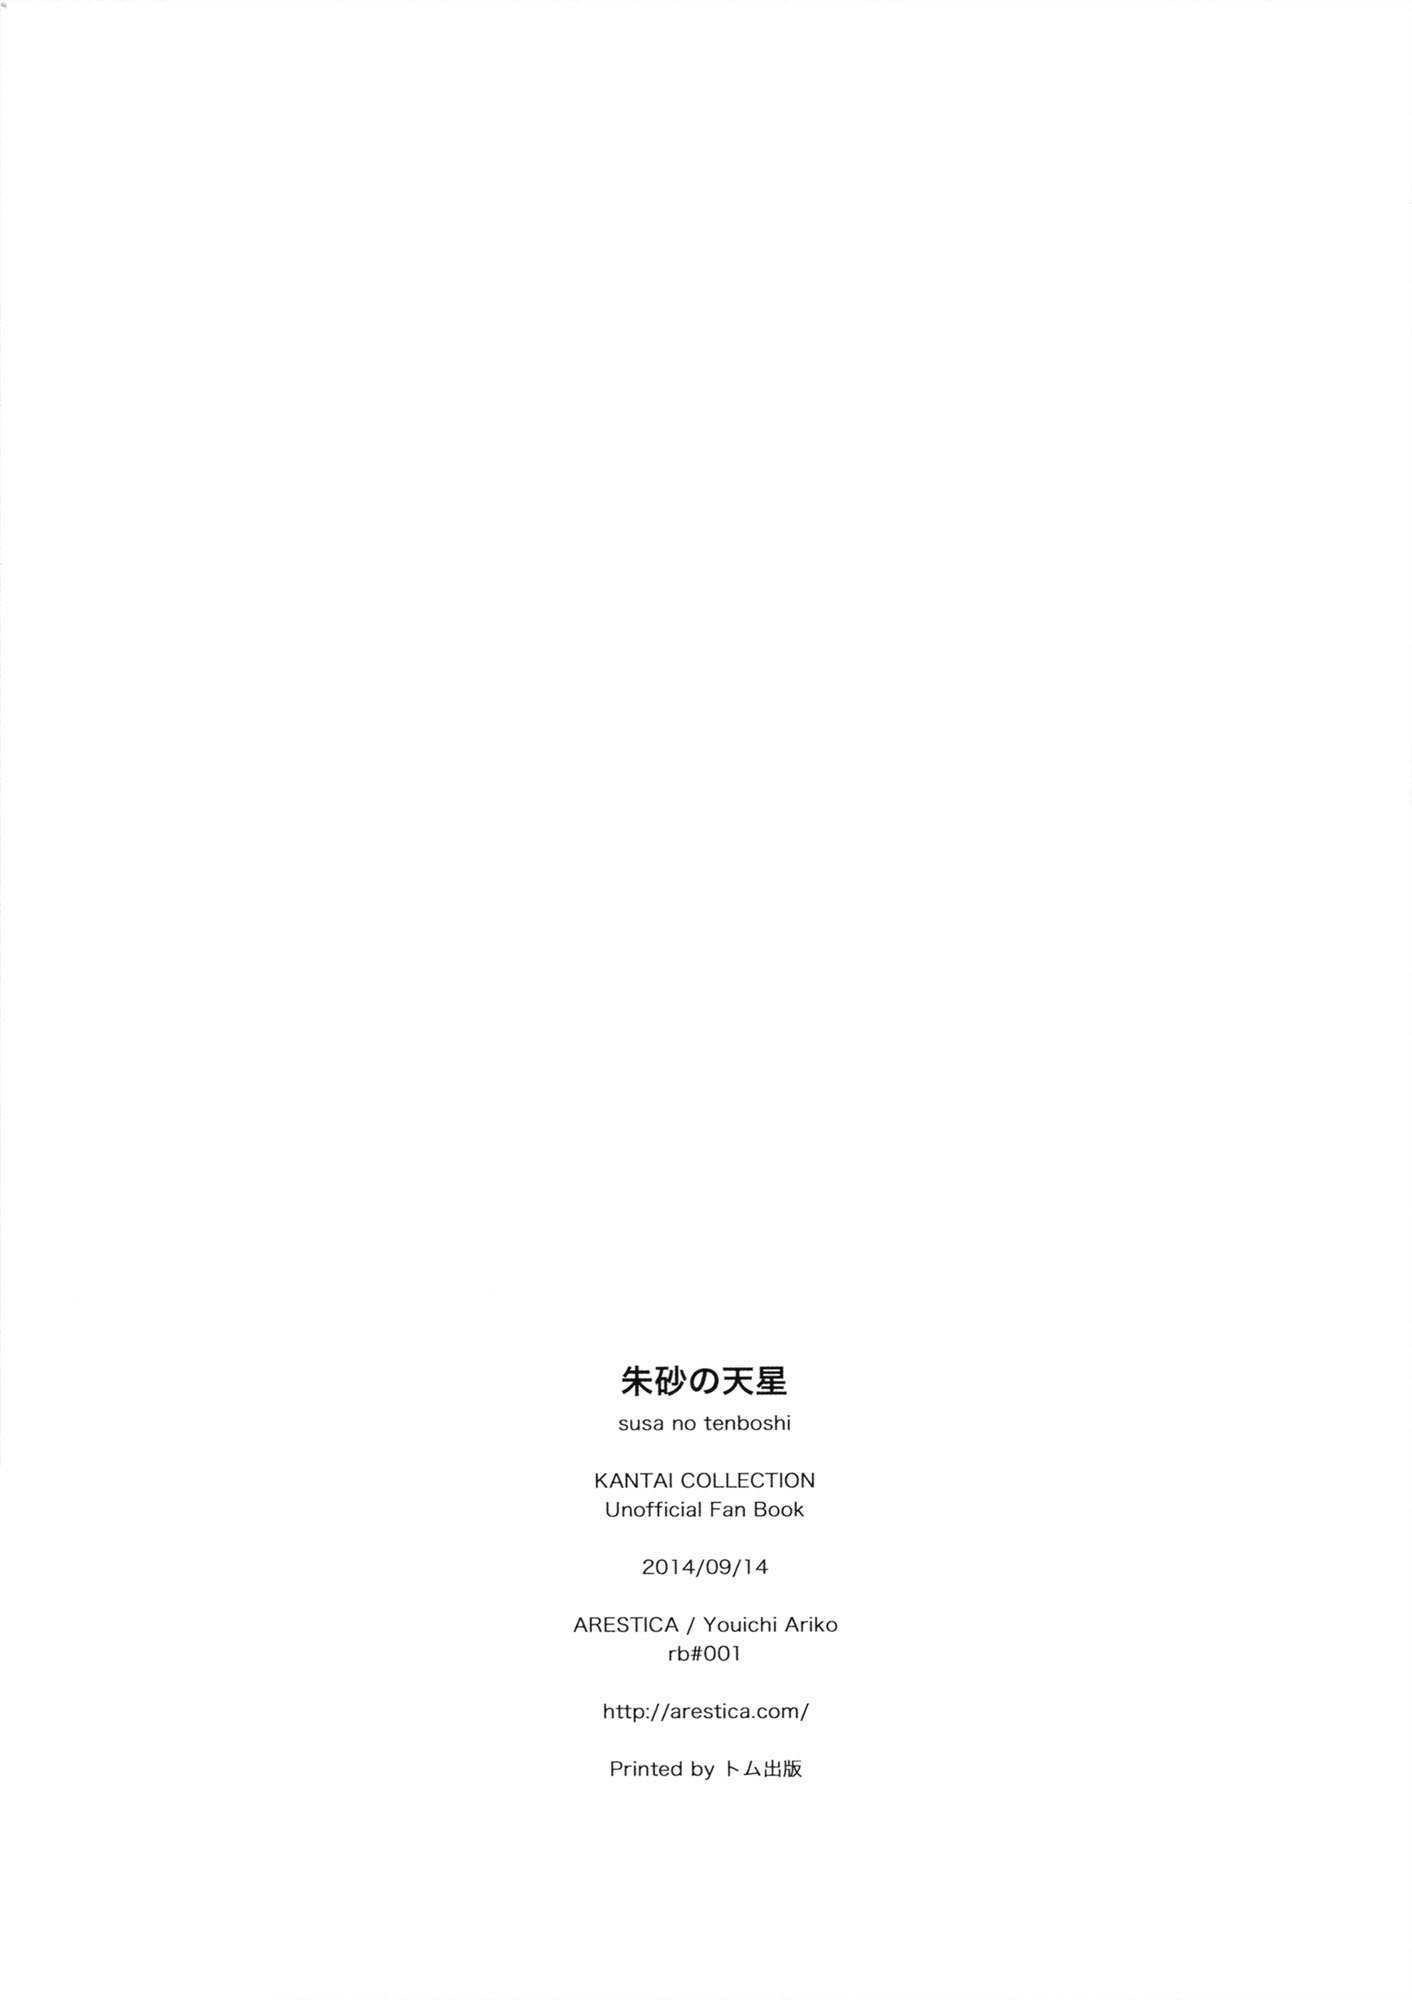 Hình ảnh H00019 in Susa no Tenboshi